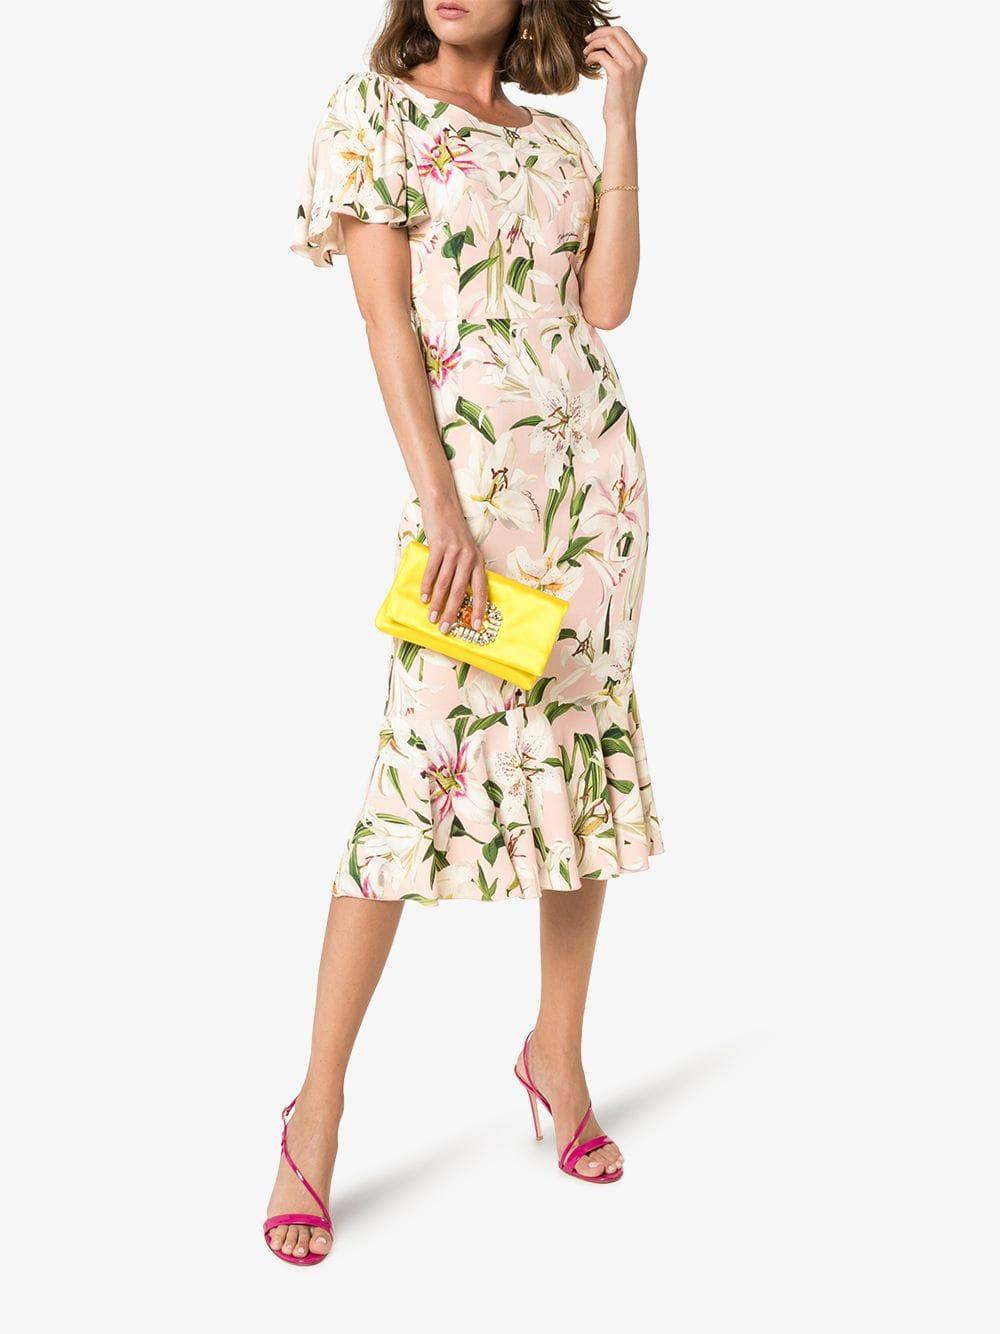 DOLCE & GABBANA Lily Print Flounce Silk Dress